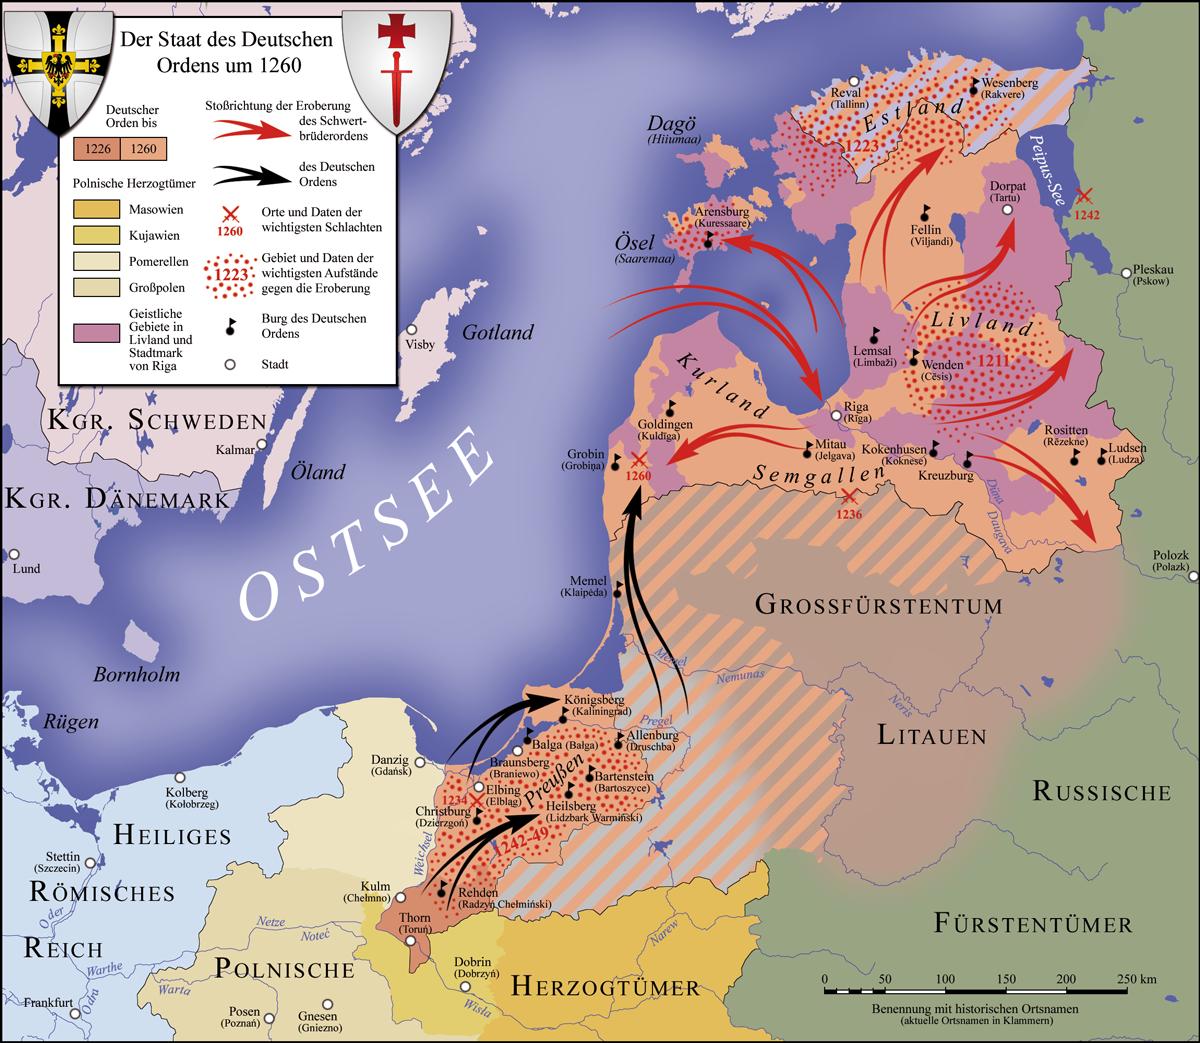 Deutscher_Orden_1260